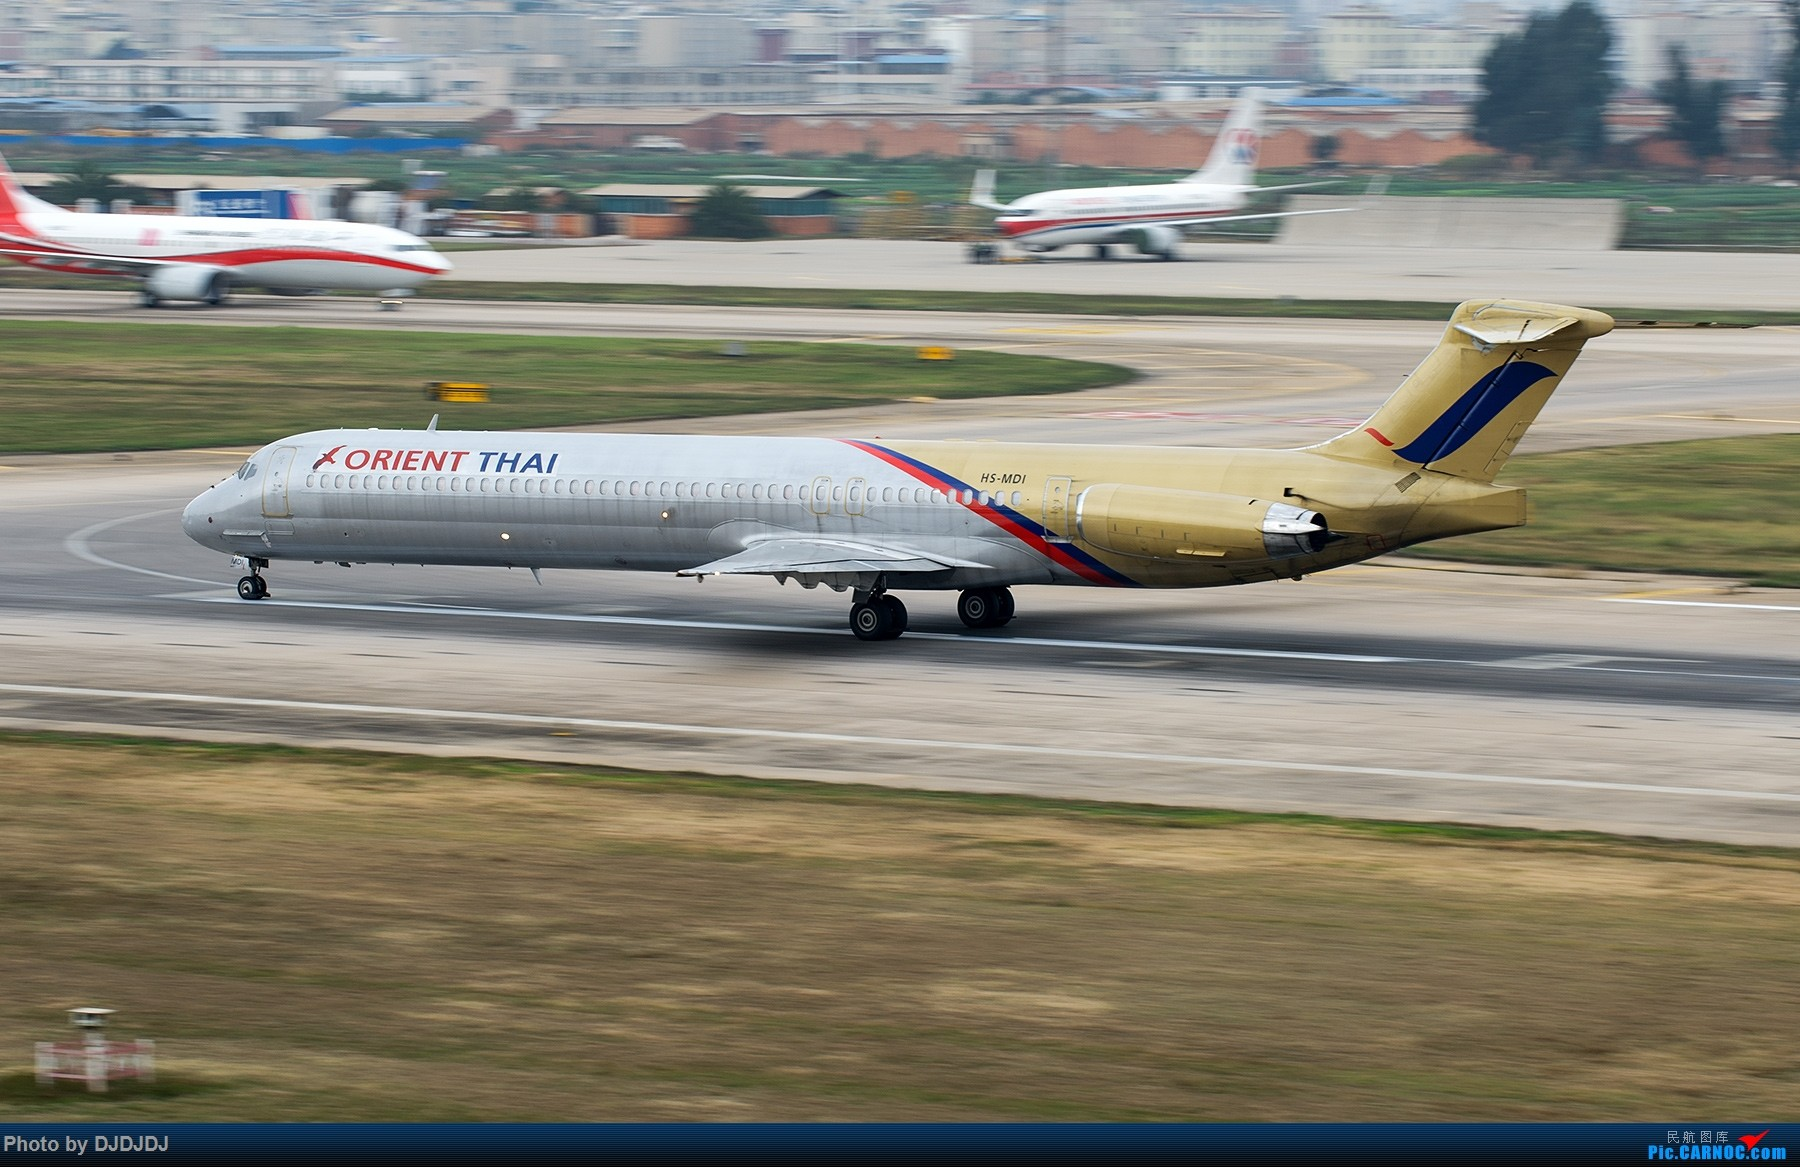 Re:[原创]【BLDDQ】珍藏的小动感 MD-90 HS-MDI 中国昆明长水国际机场机场